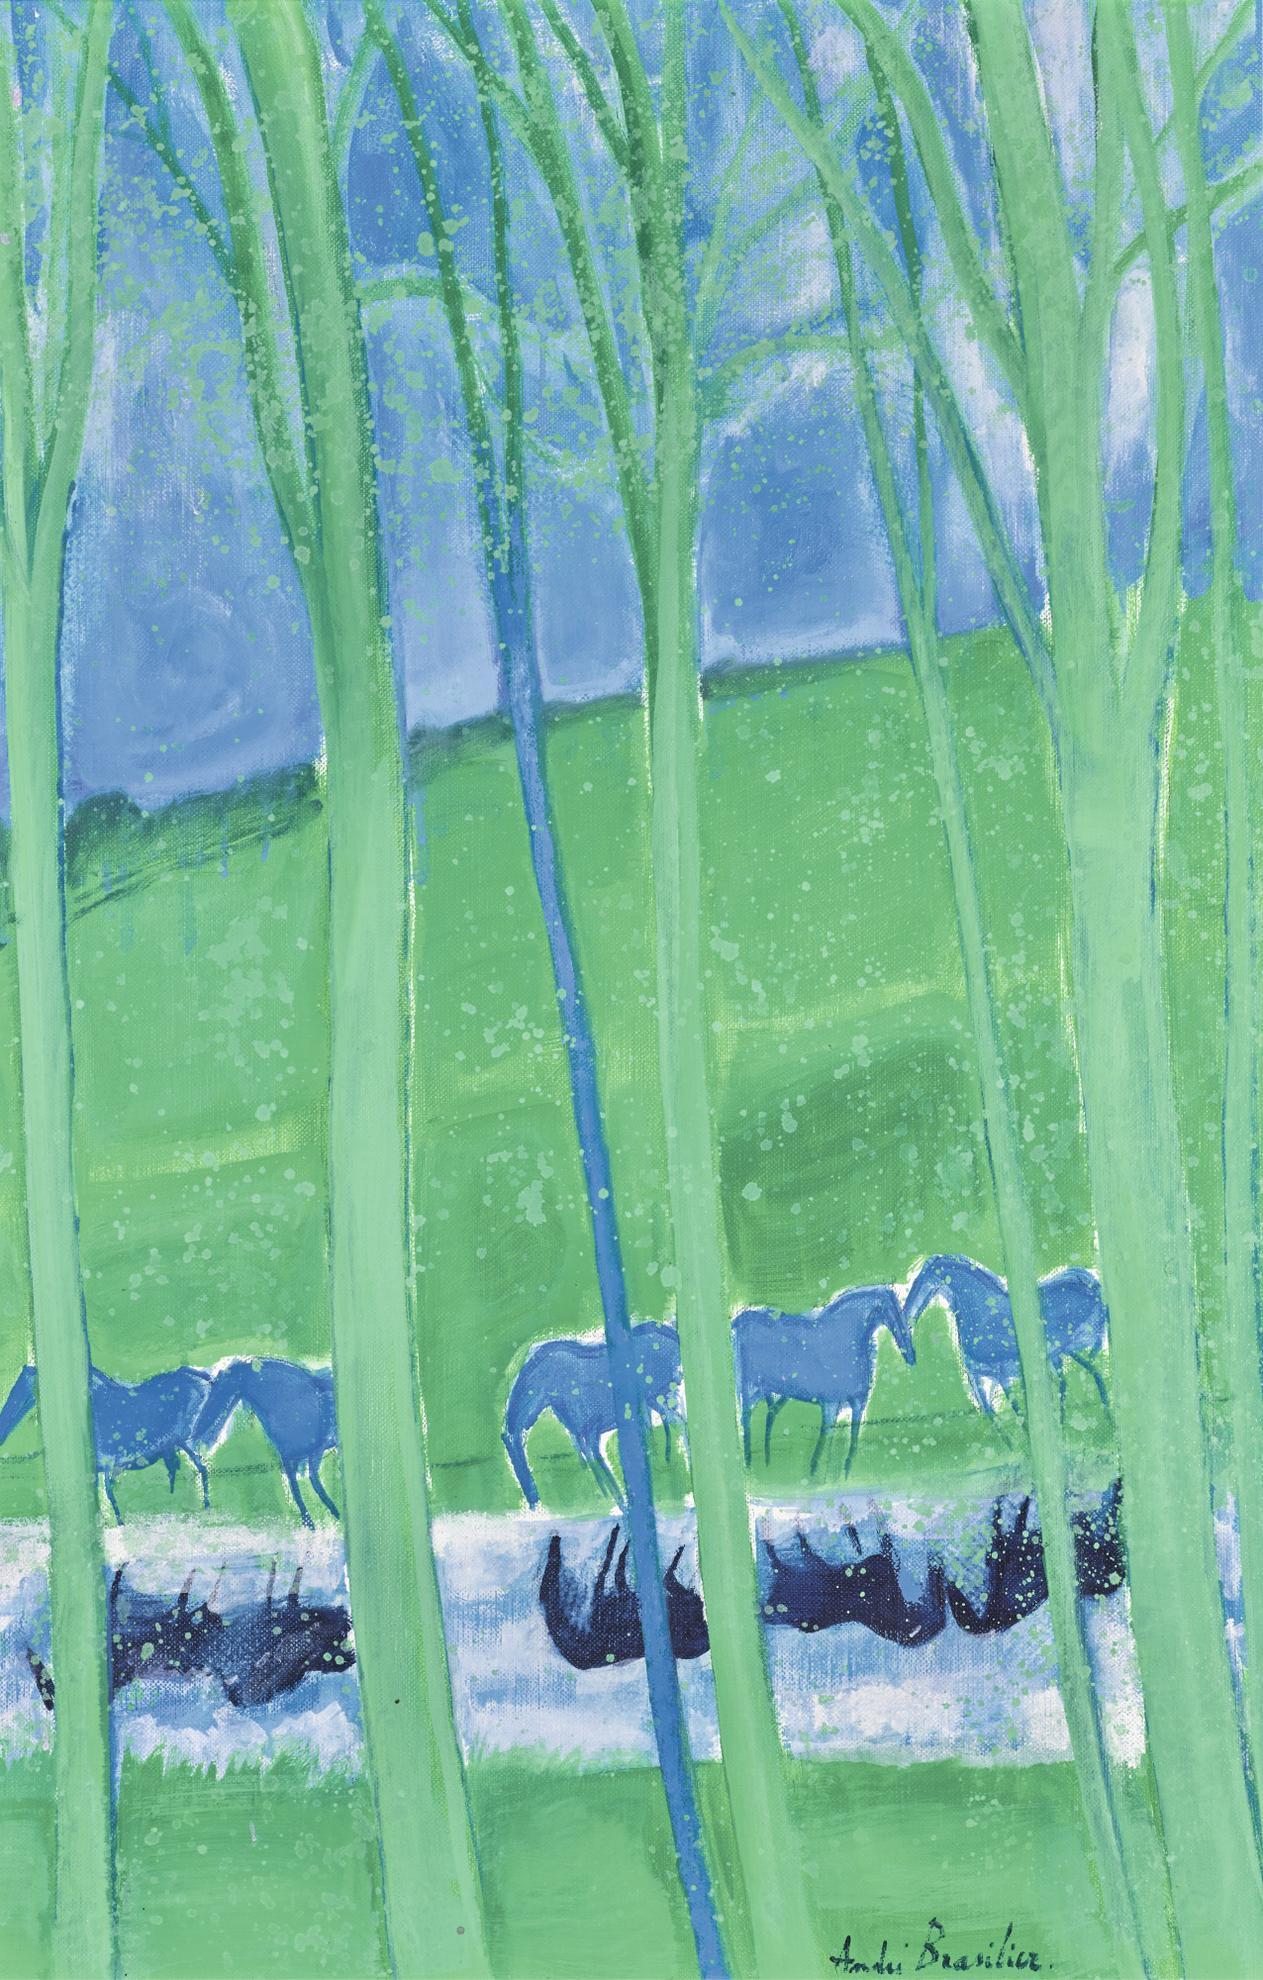 Andre Brasilier-Reflets Sur La Riviere-1991